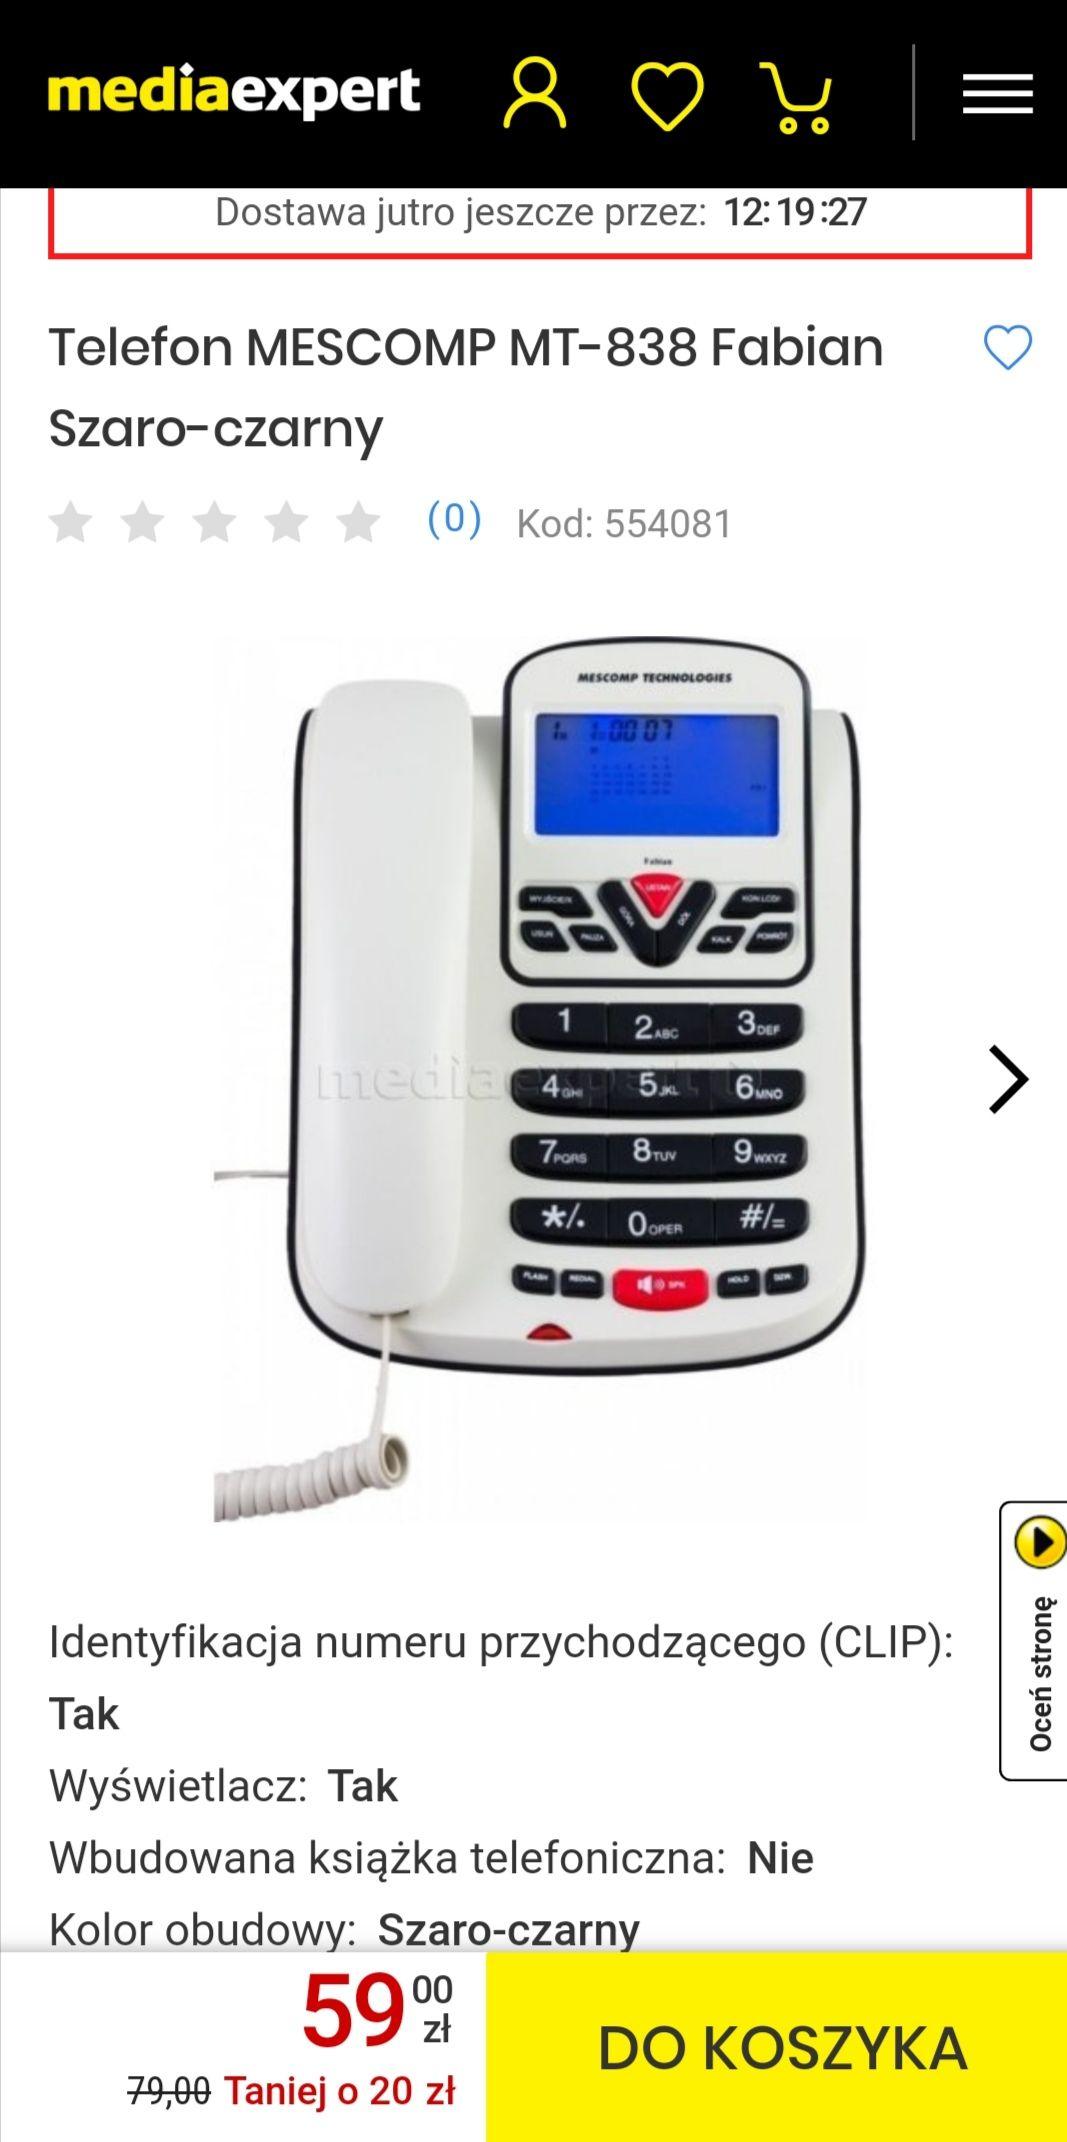 Tani telefon stacjonarny MESCOMP MT-838